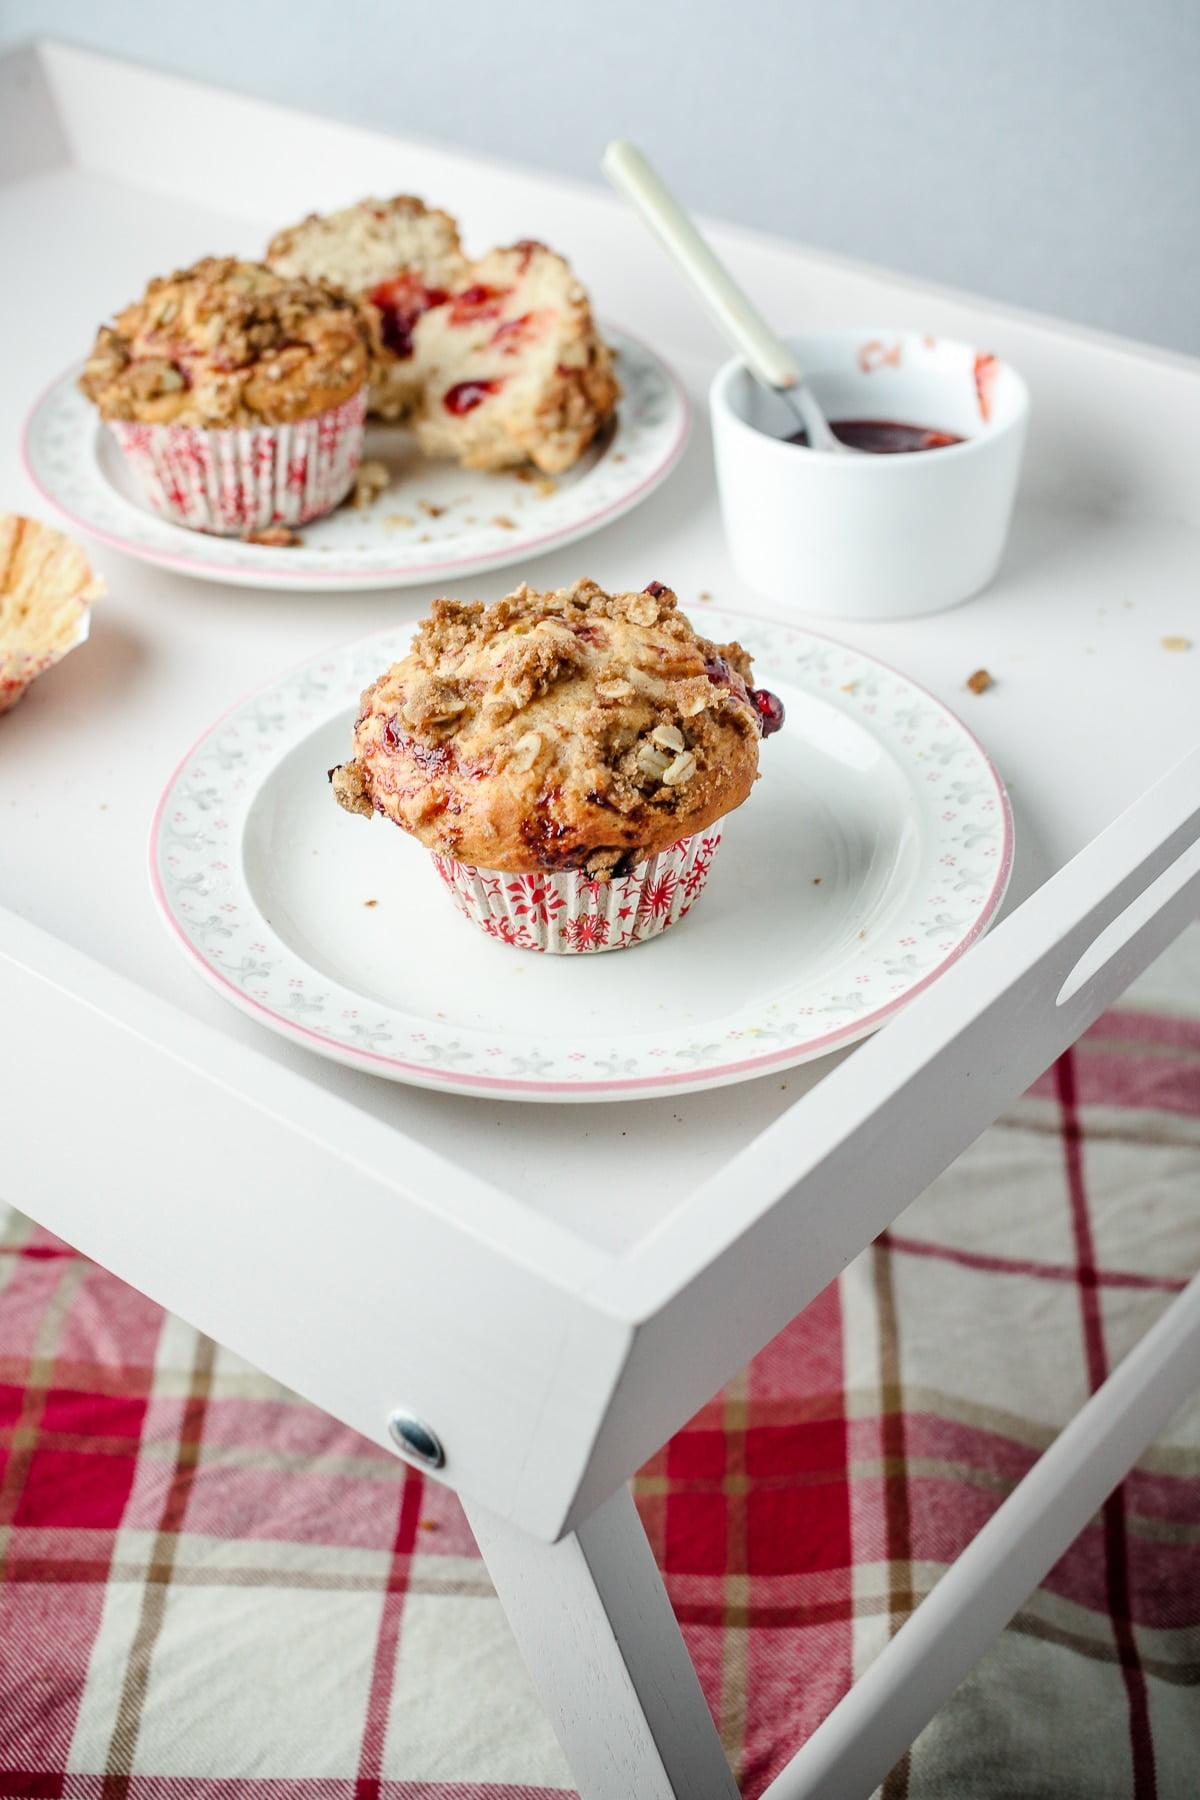 #Vegan Cranberry & Orange Streusel Muffins